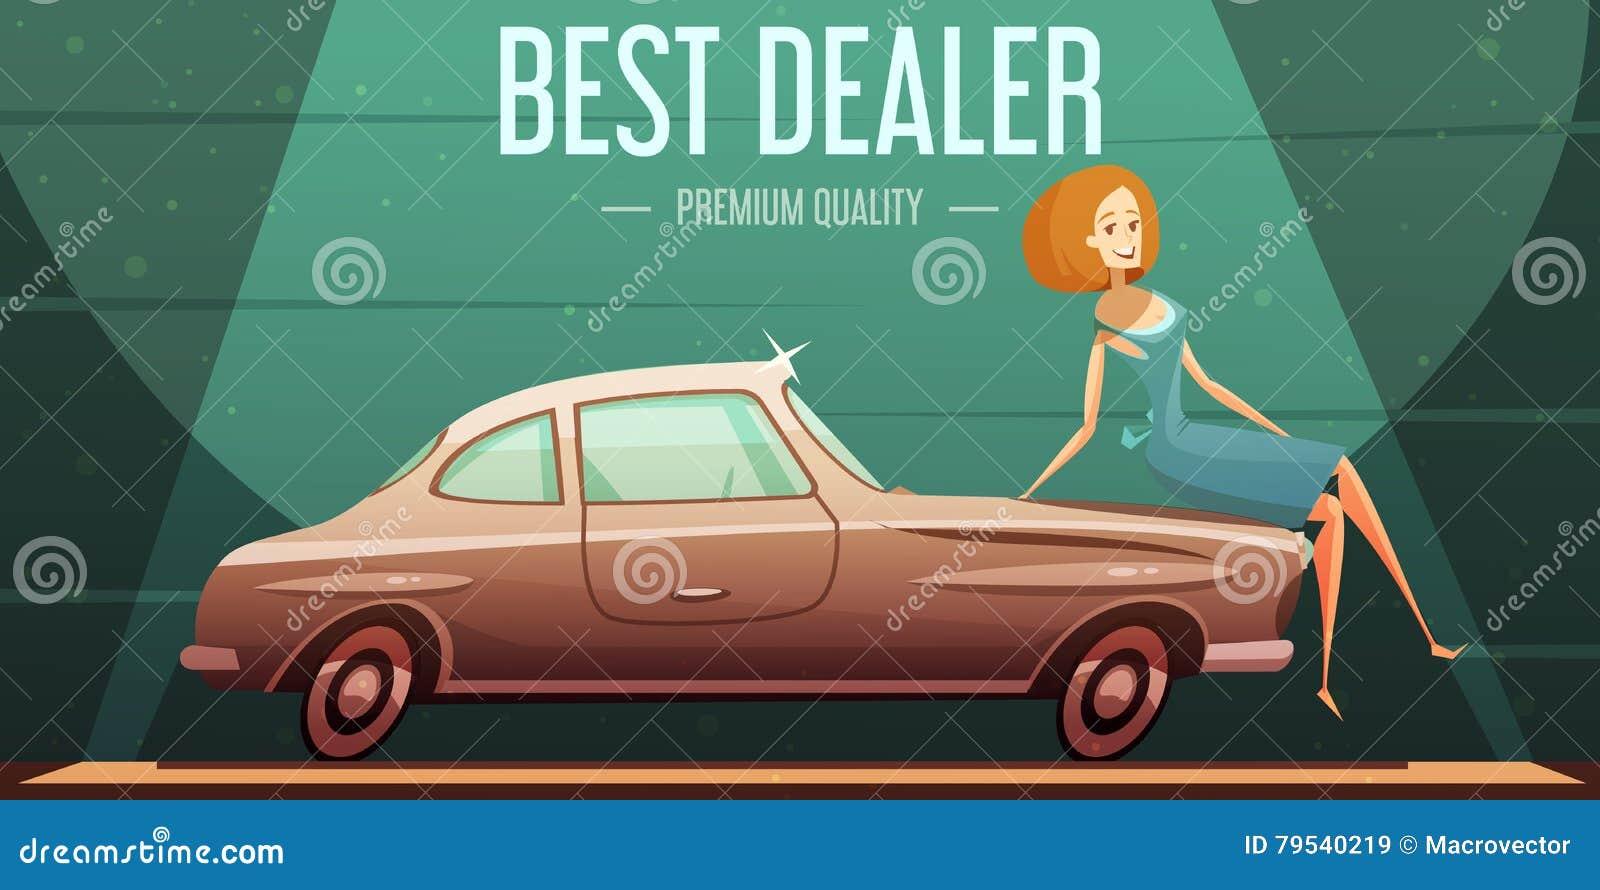 Vintage Car Sale Dealer Retro Poster Stock Vector - Image: 79540219